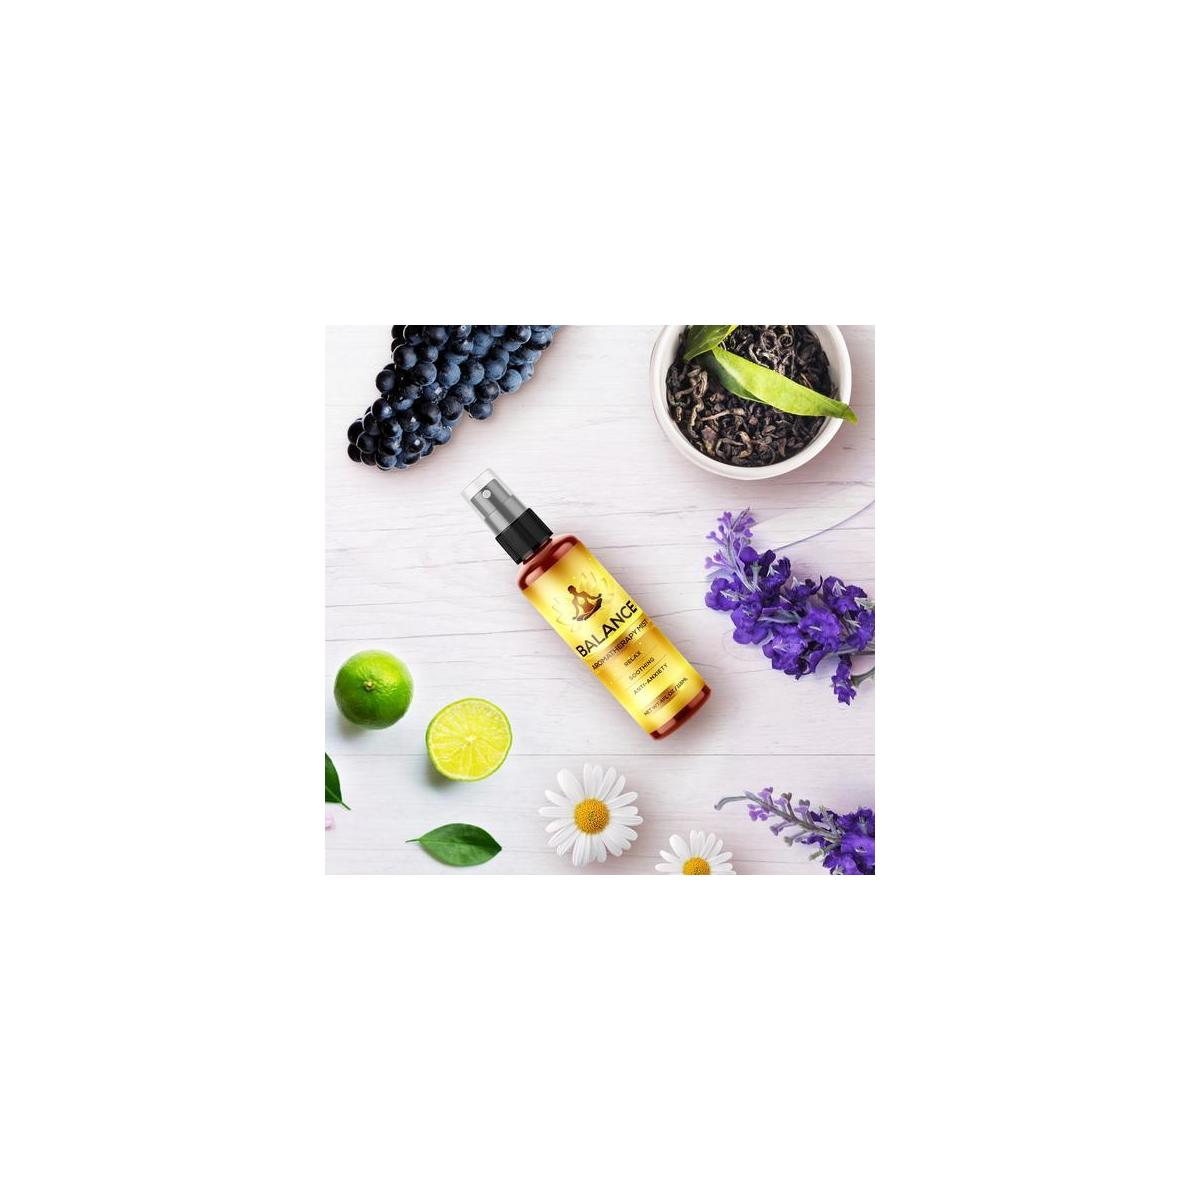 Balance Aromatherapy Mist